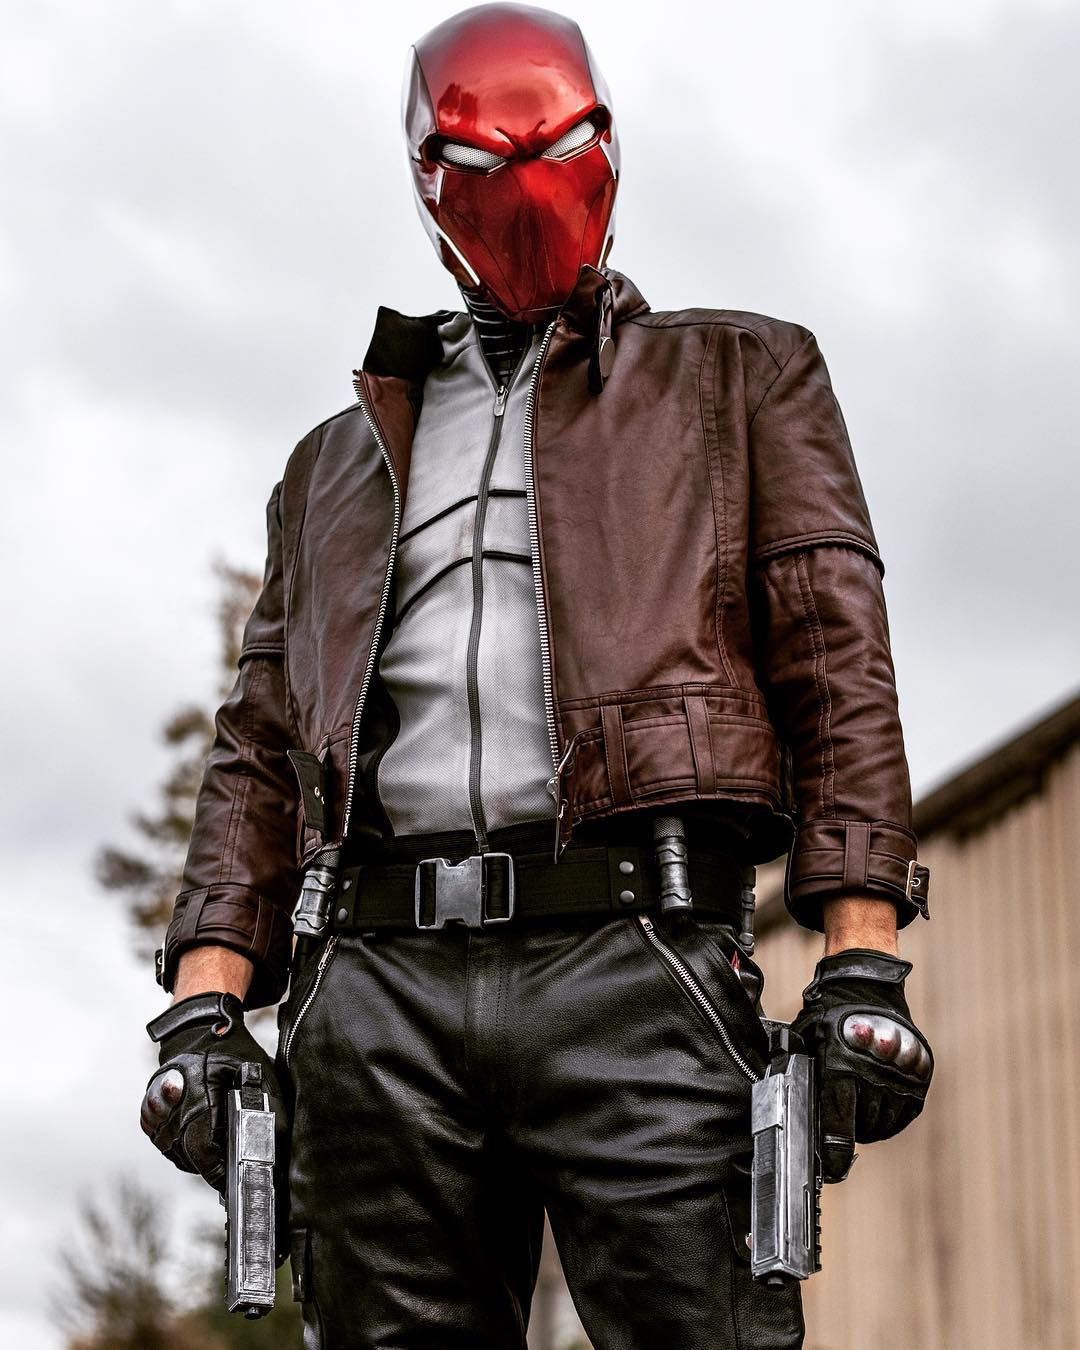 Jensen Ackles Red Hood